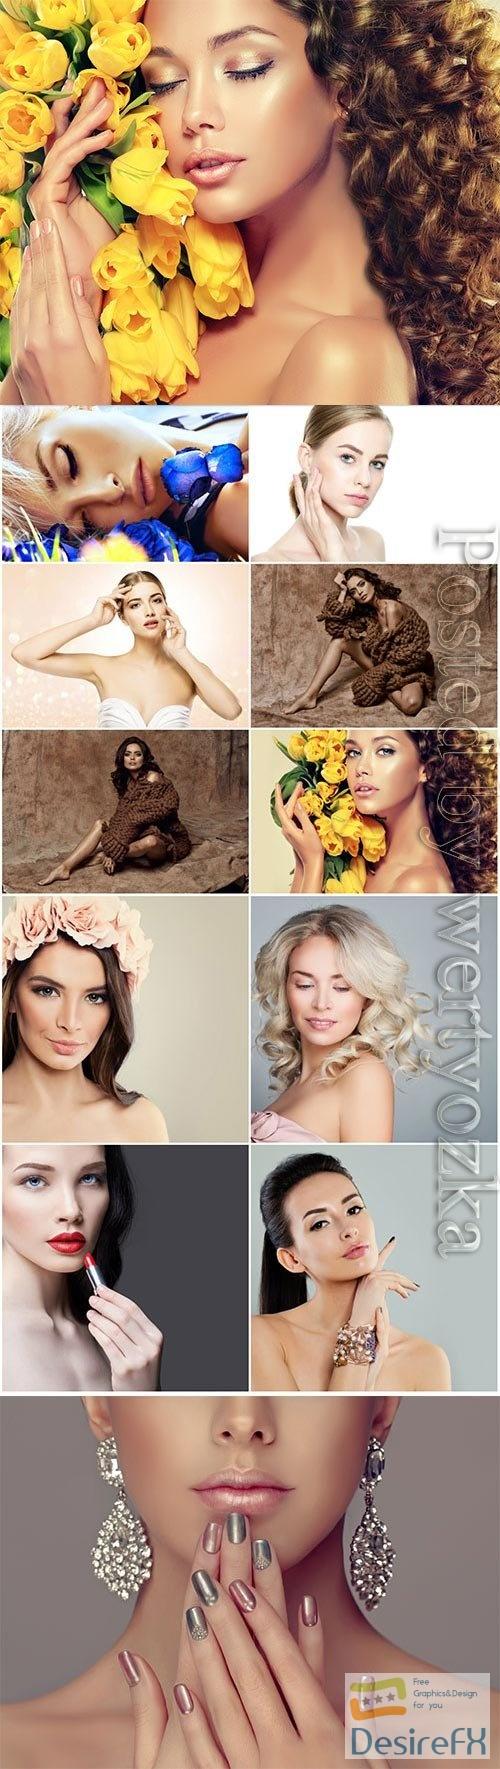 Beautiful girls posing with flowers stock photo